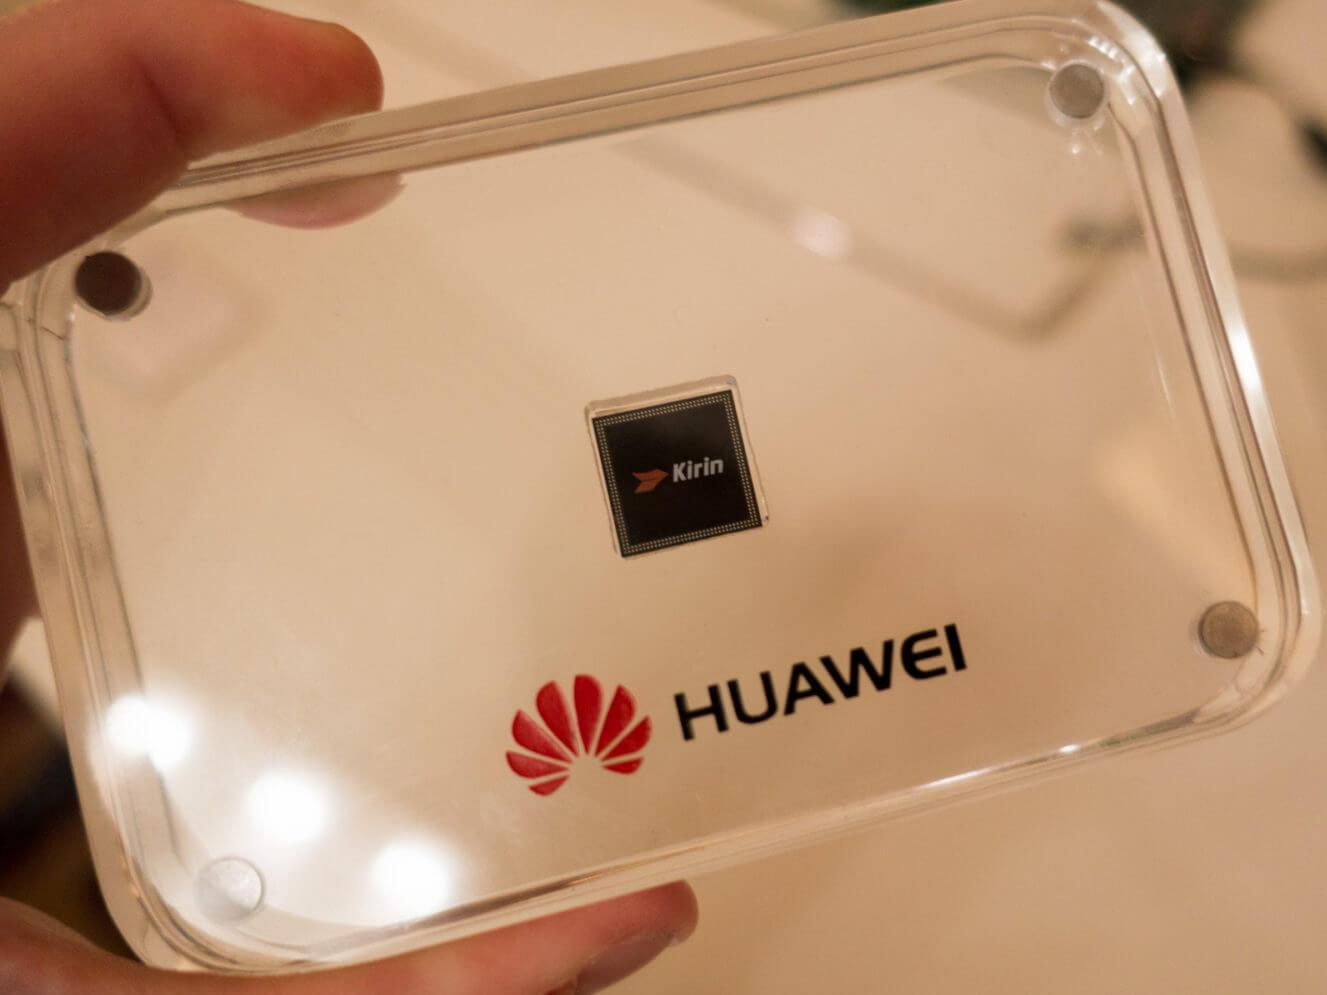 Huawei kirin 950 ah 1 1600x1067